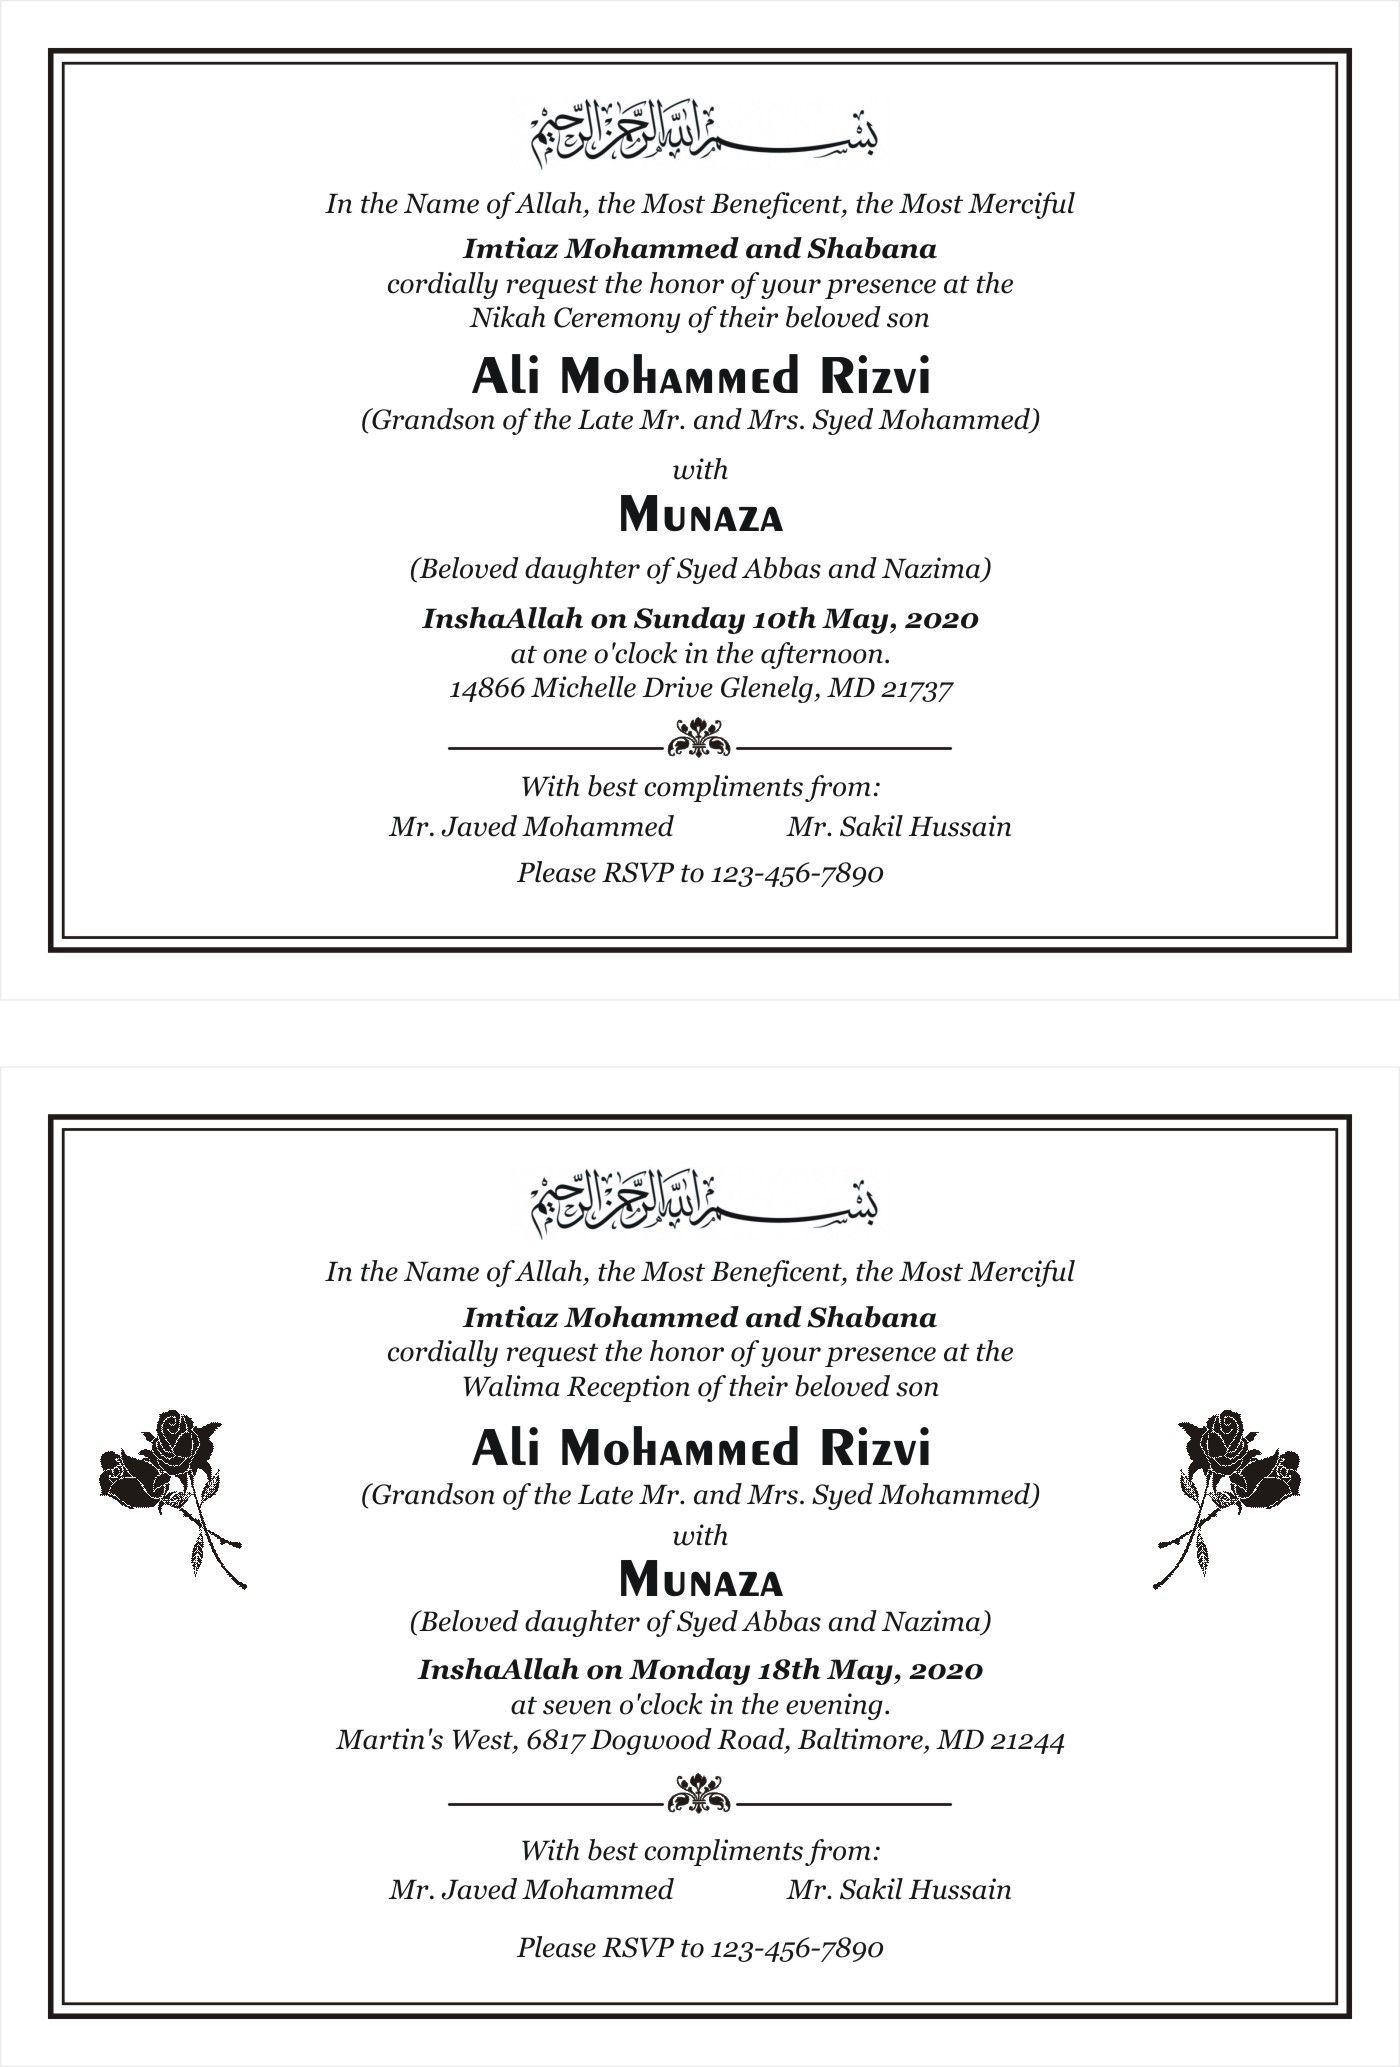 Marriage Card Wording Muslim Wedding Invitations Marriage Invitation Card Wedding Card Wordings